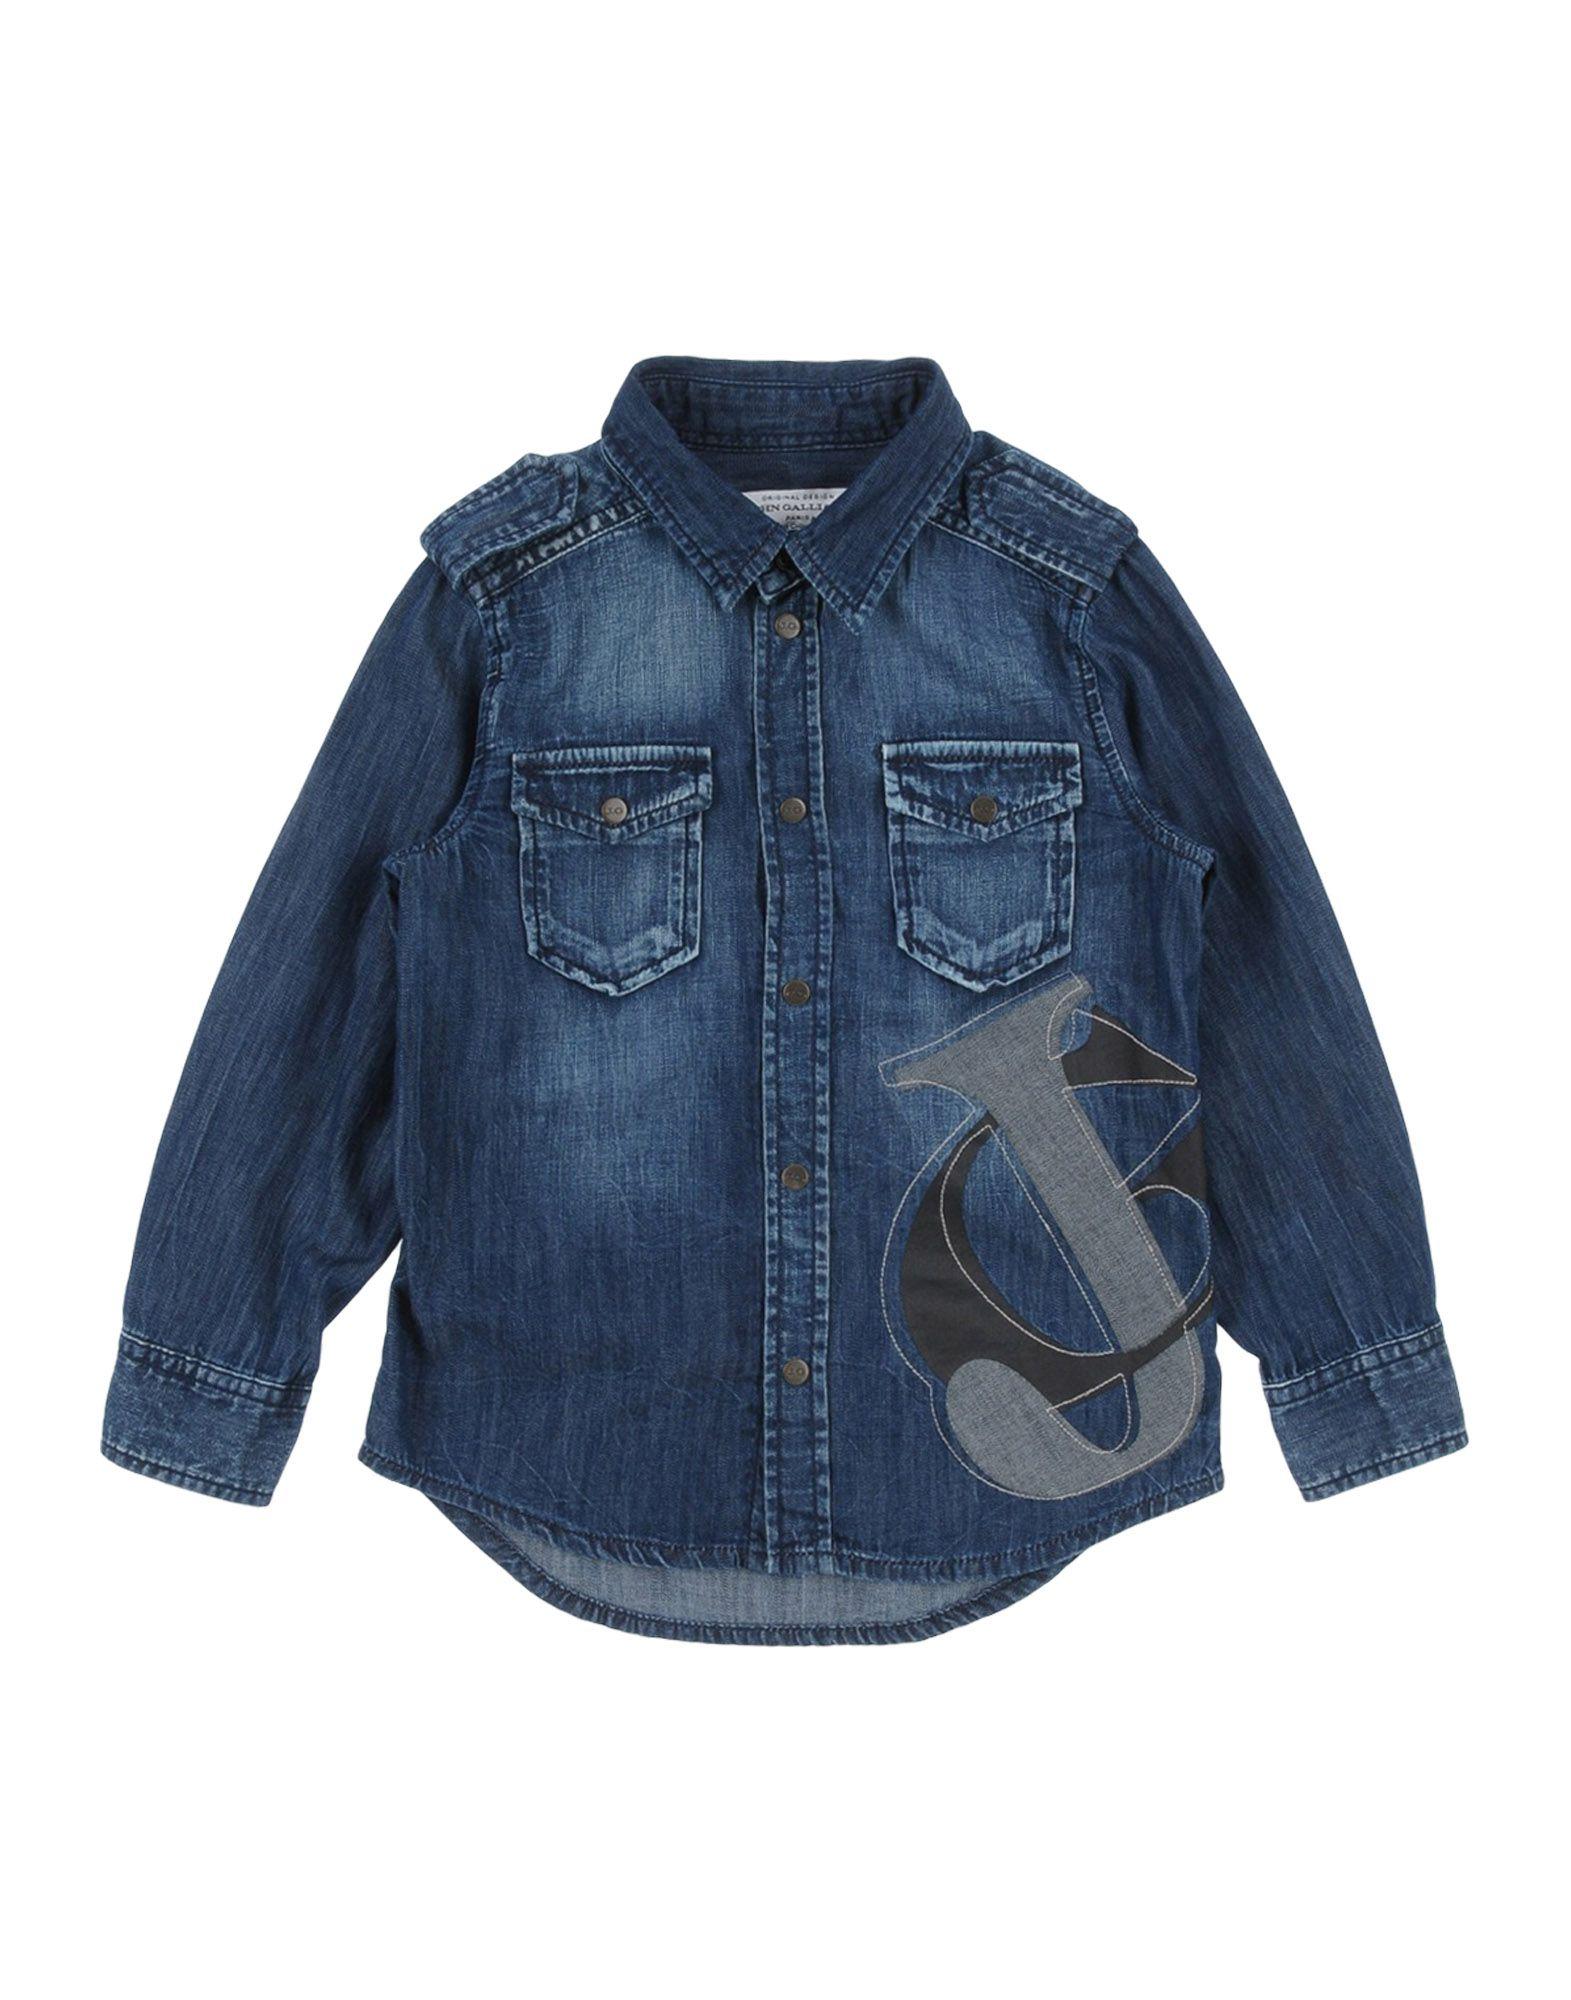 JOHN GALLIANO KIDS Джинсовая рубашка